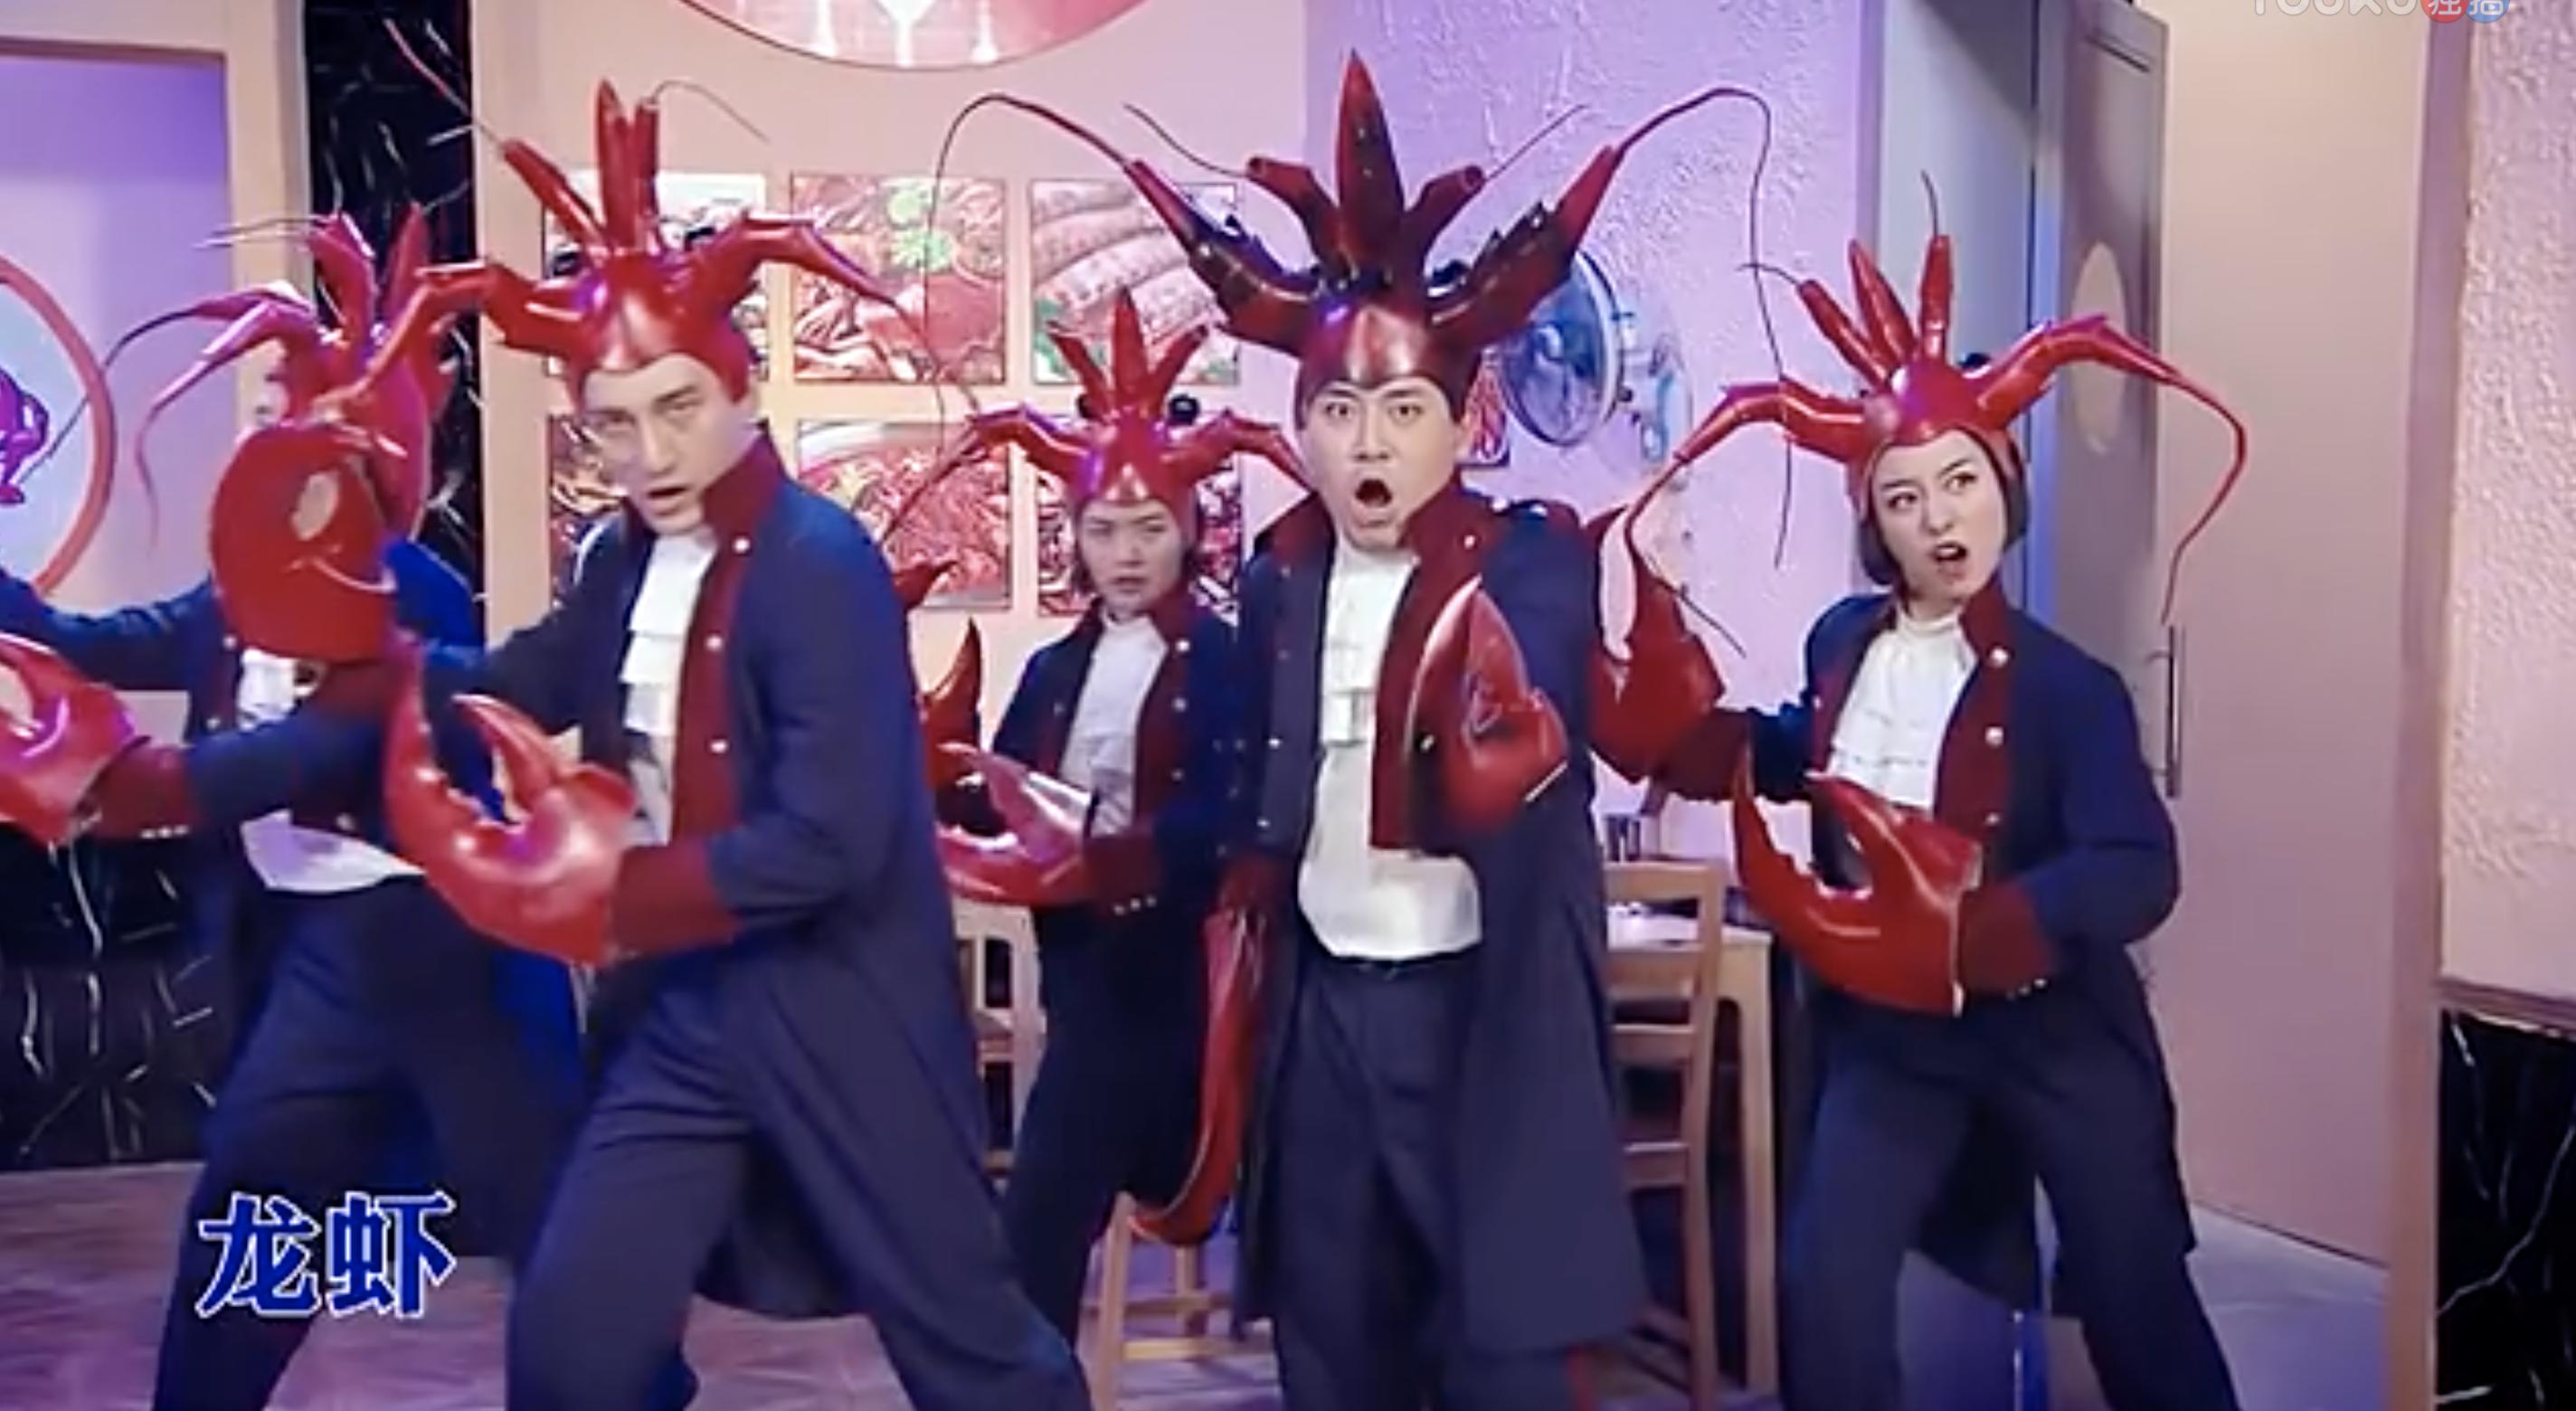 A crawfish skit on Saturday Night Live China.